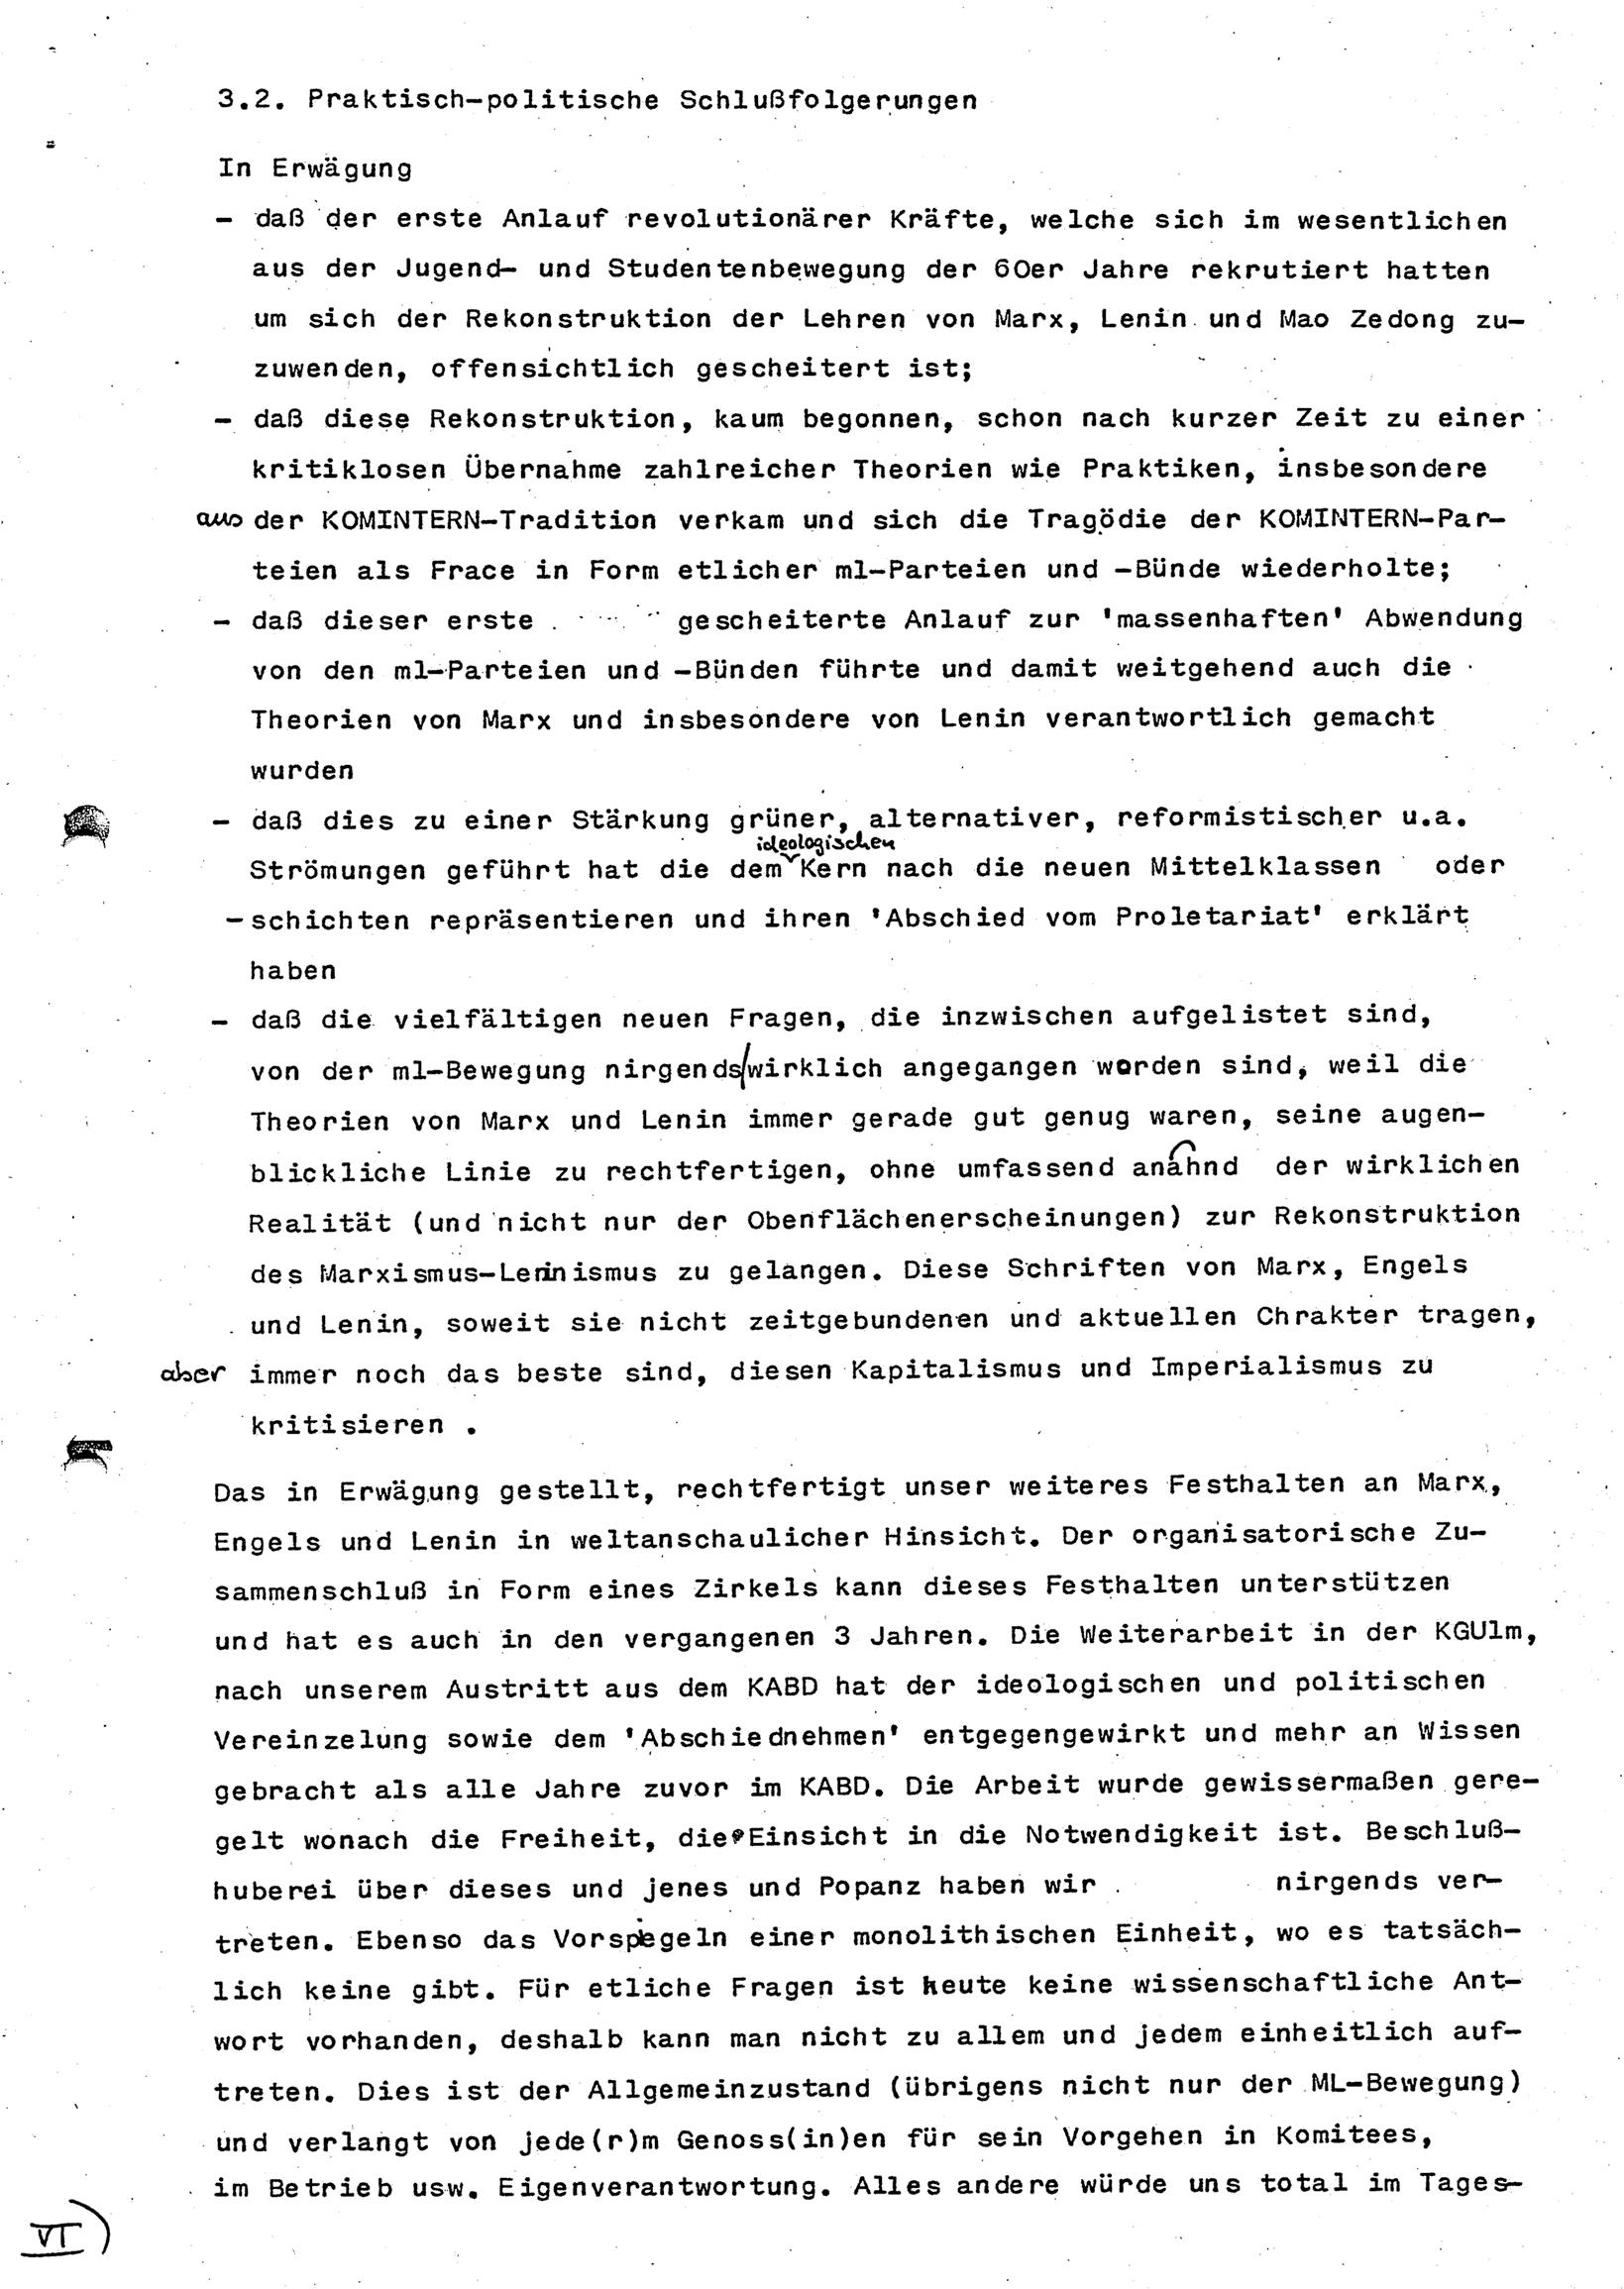 Ulm_KGU_Arbeitsheft_19830425_015_067